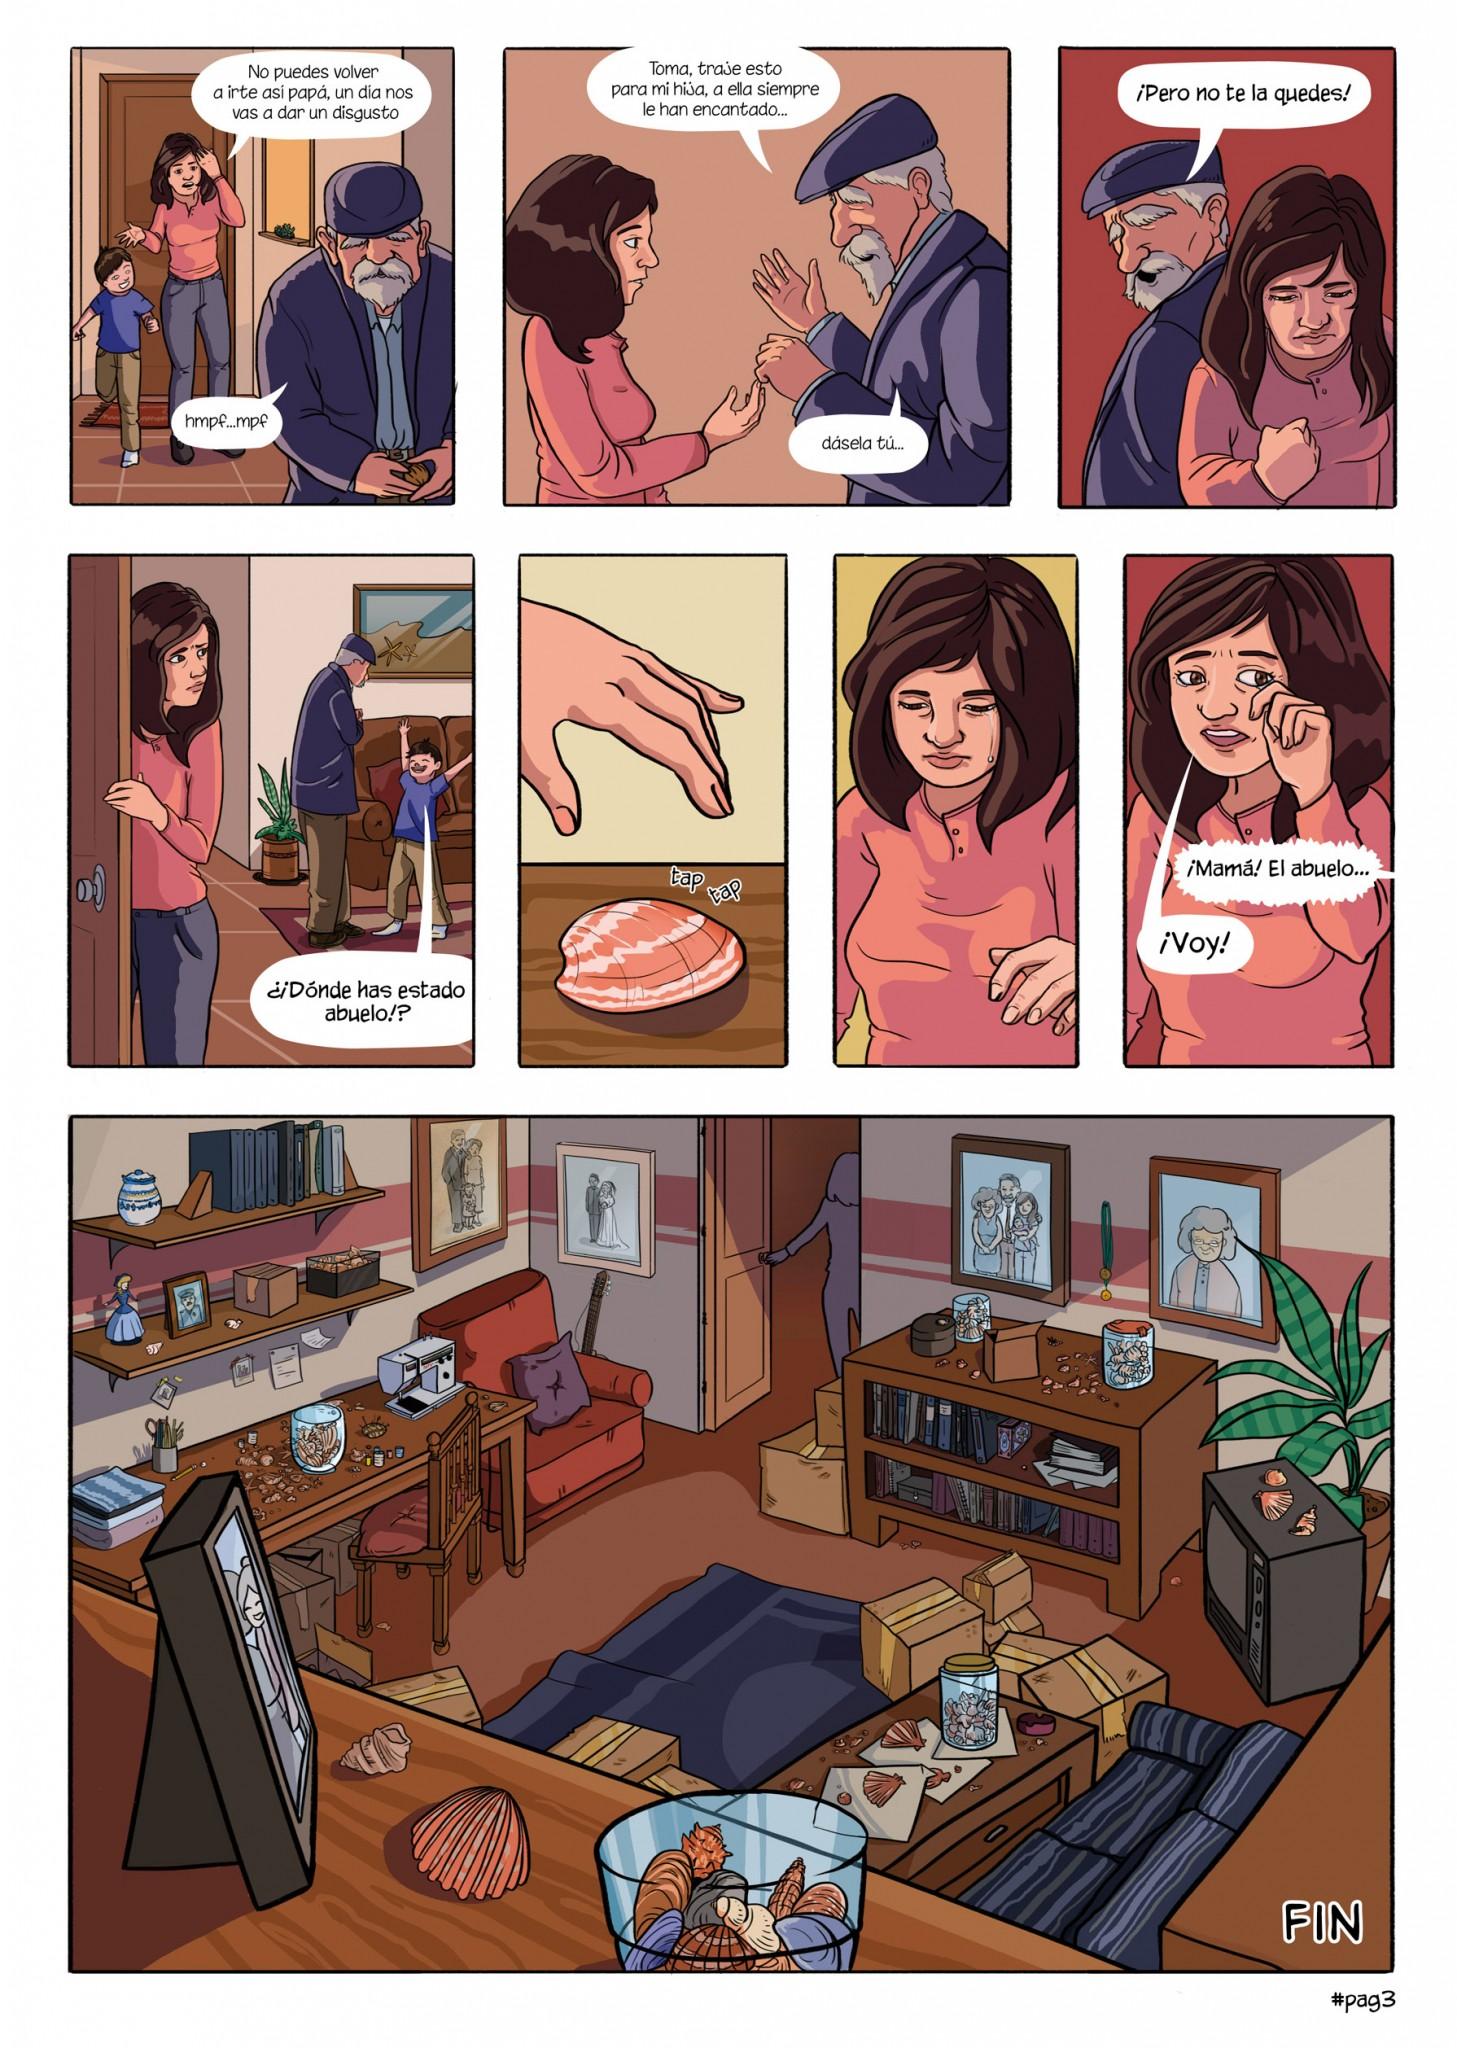 Pagina comic 03